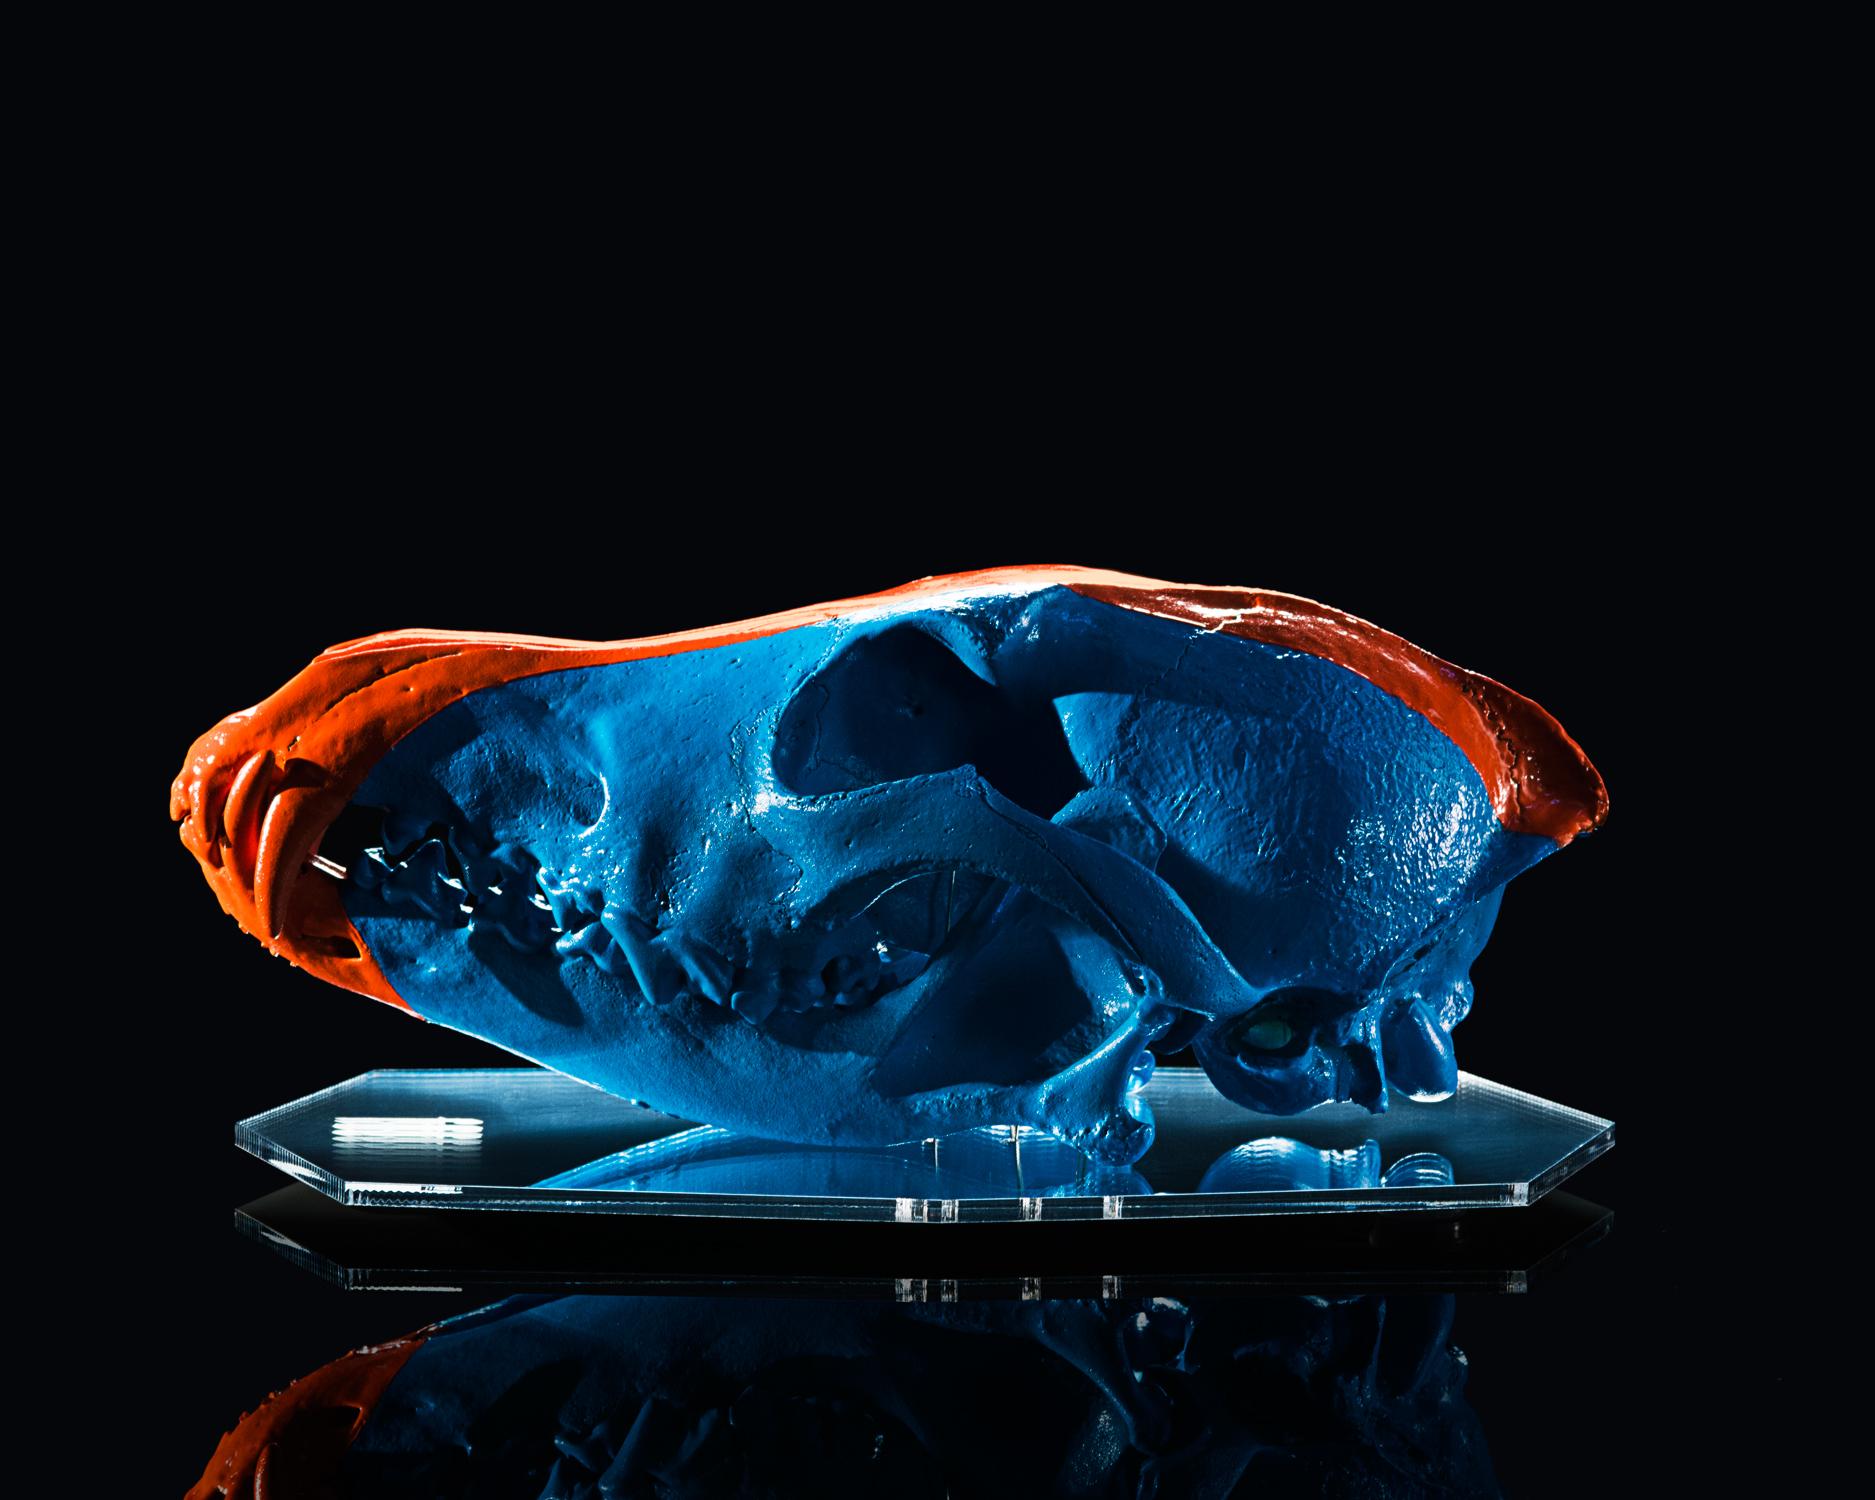 Blue & Orange - Coyote